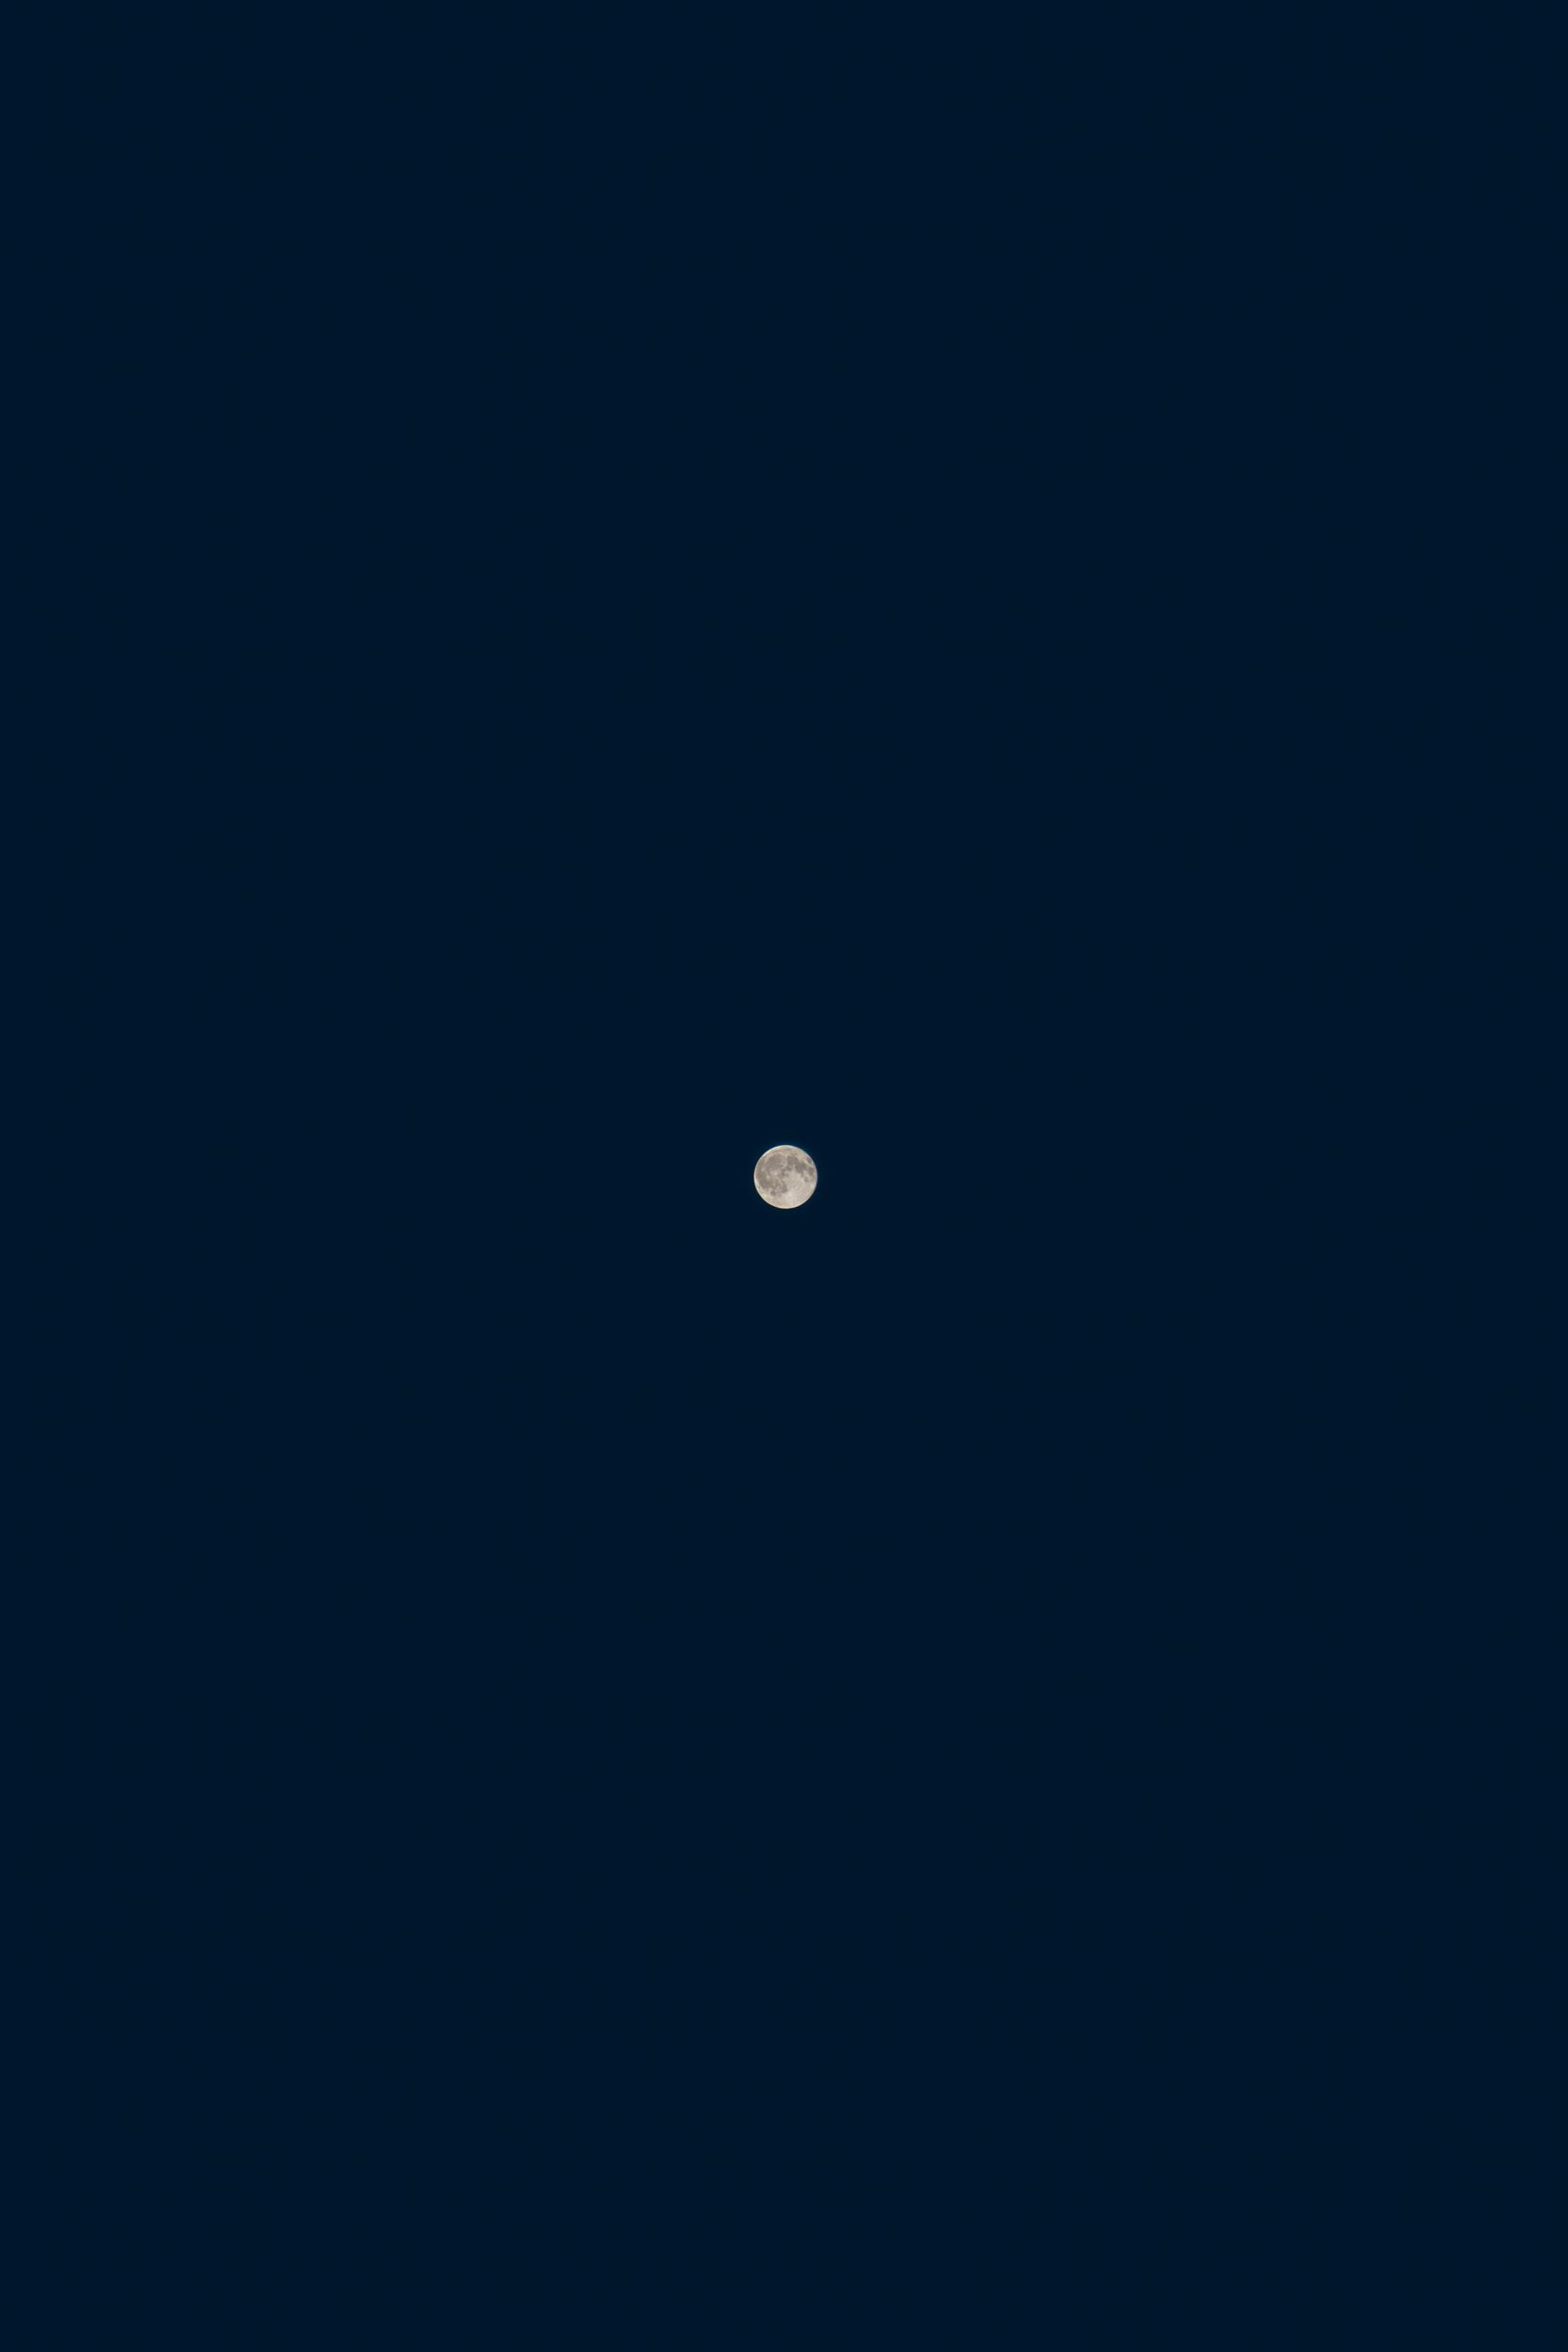 Moon #12 (Full Moon, 2016)